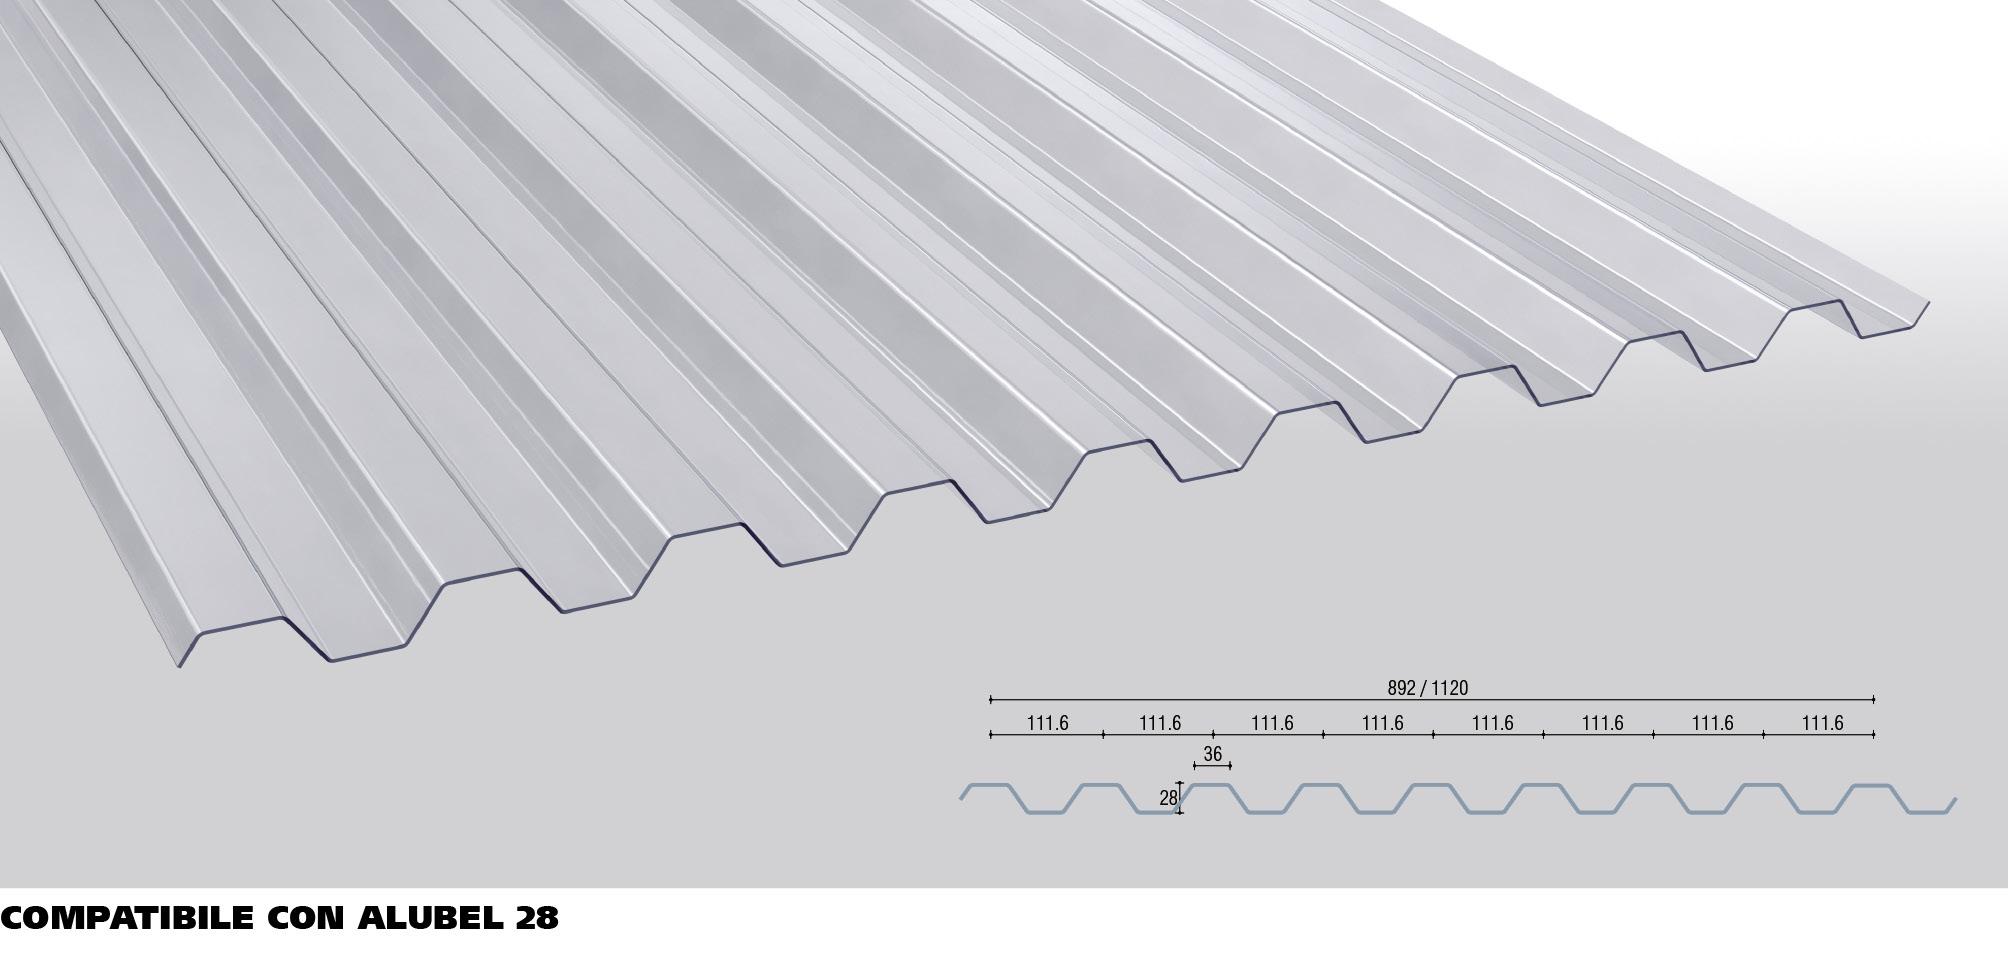 ALVEcomp - alubel 28